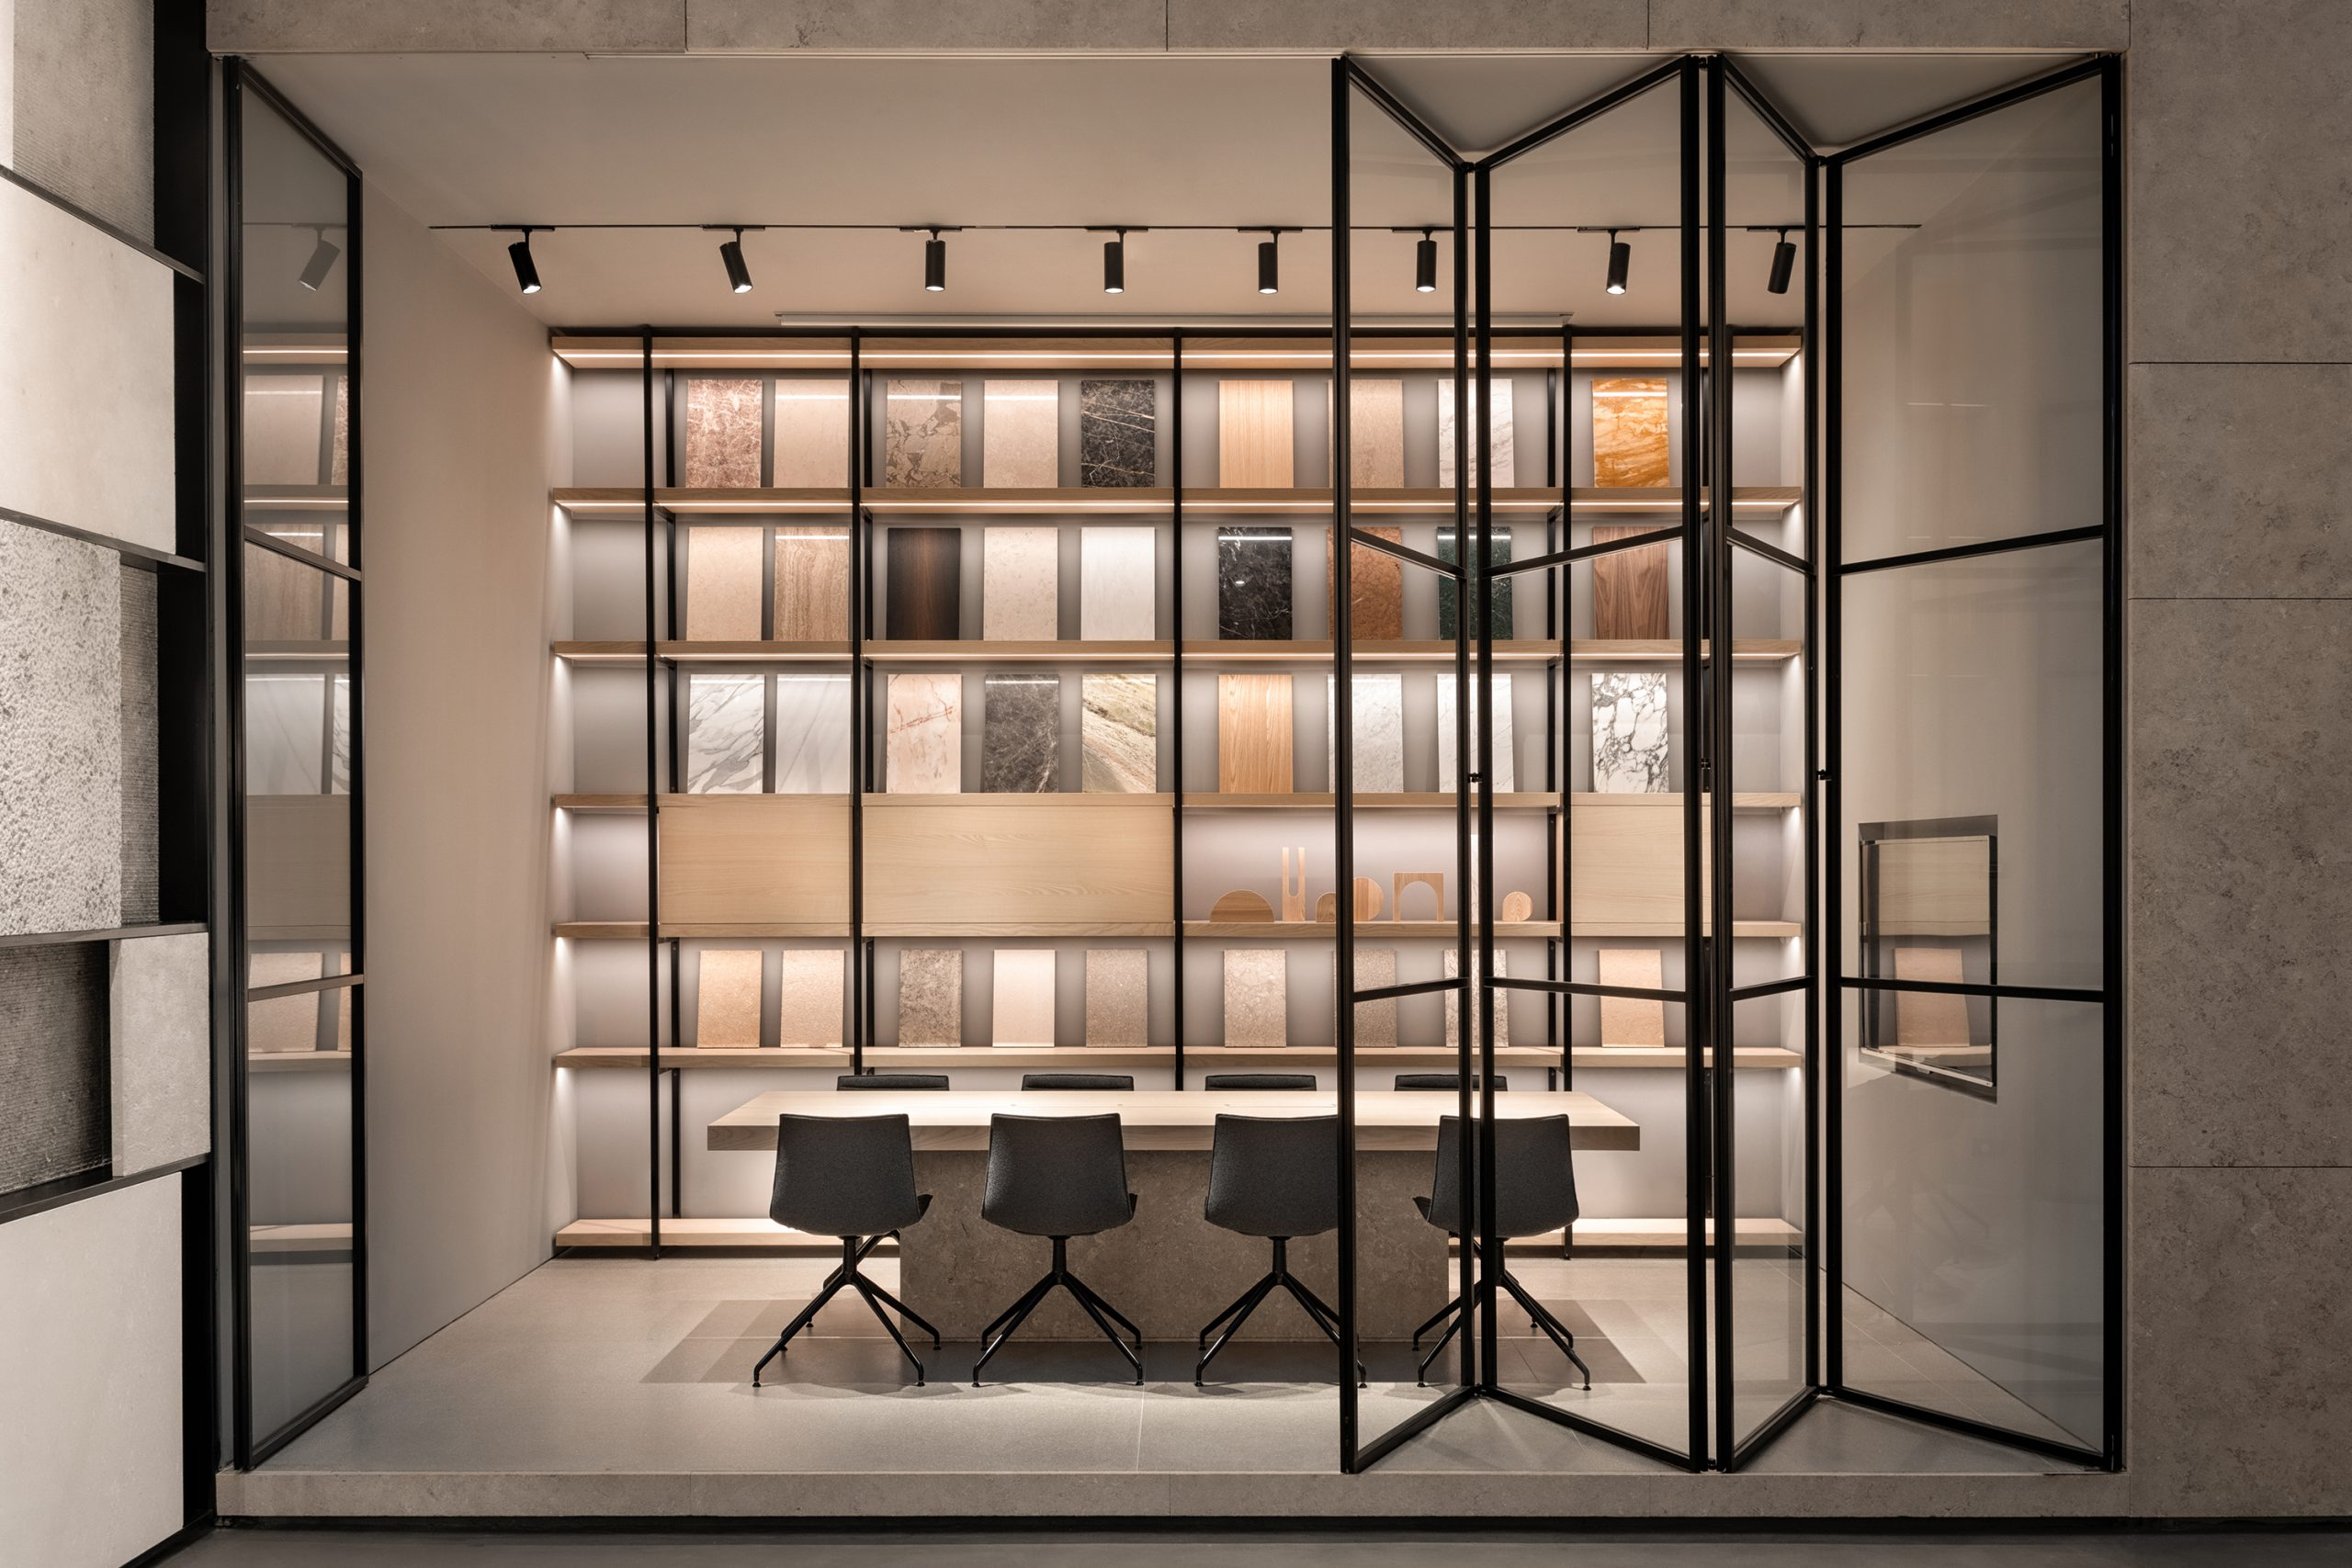 Office detail in the Showroom Interior Design by Debiasi Sandri for Grassi Pietre